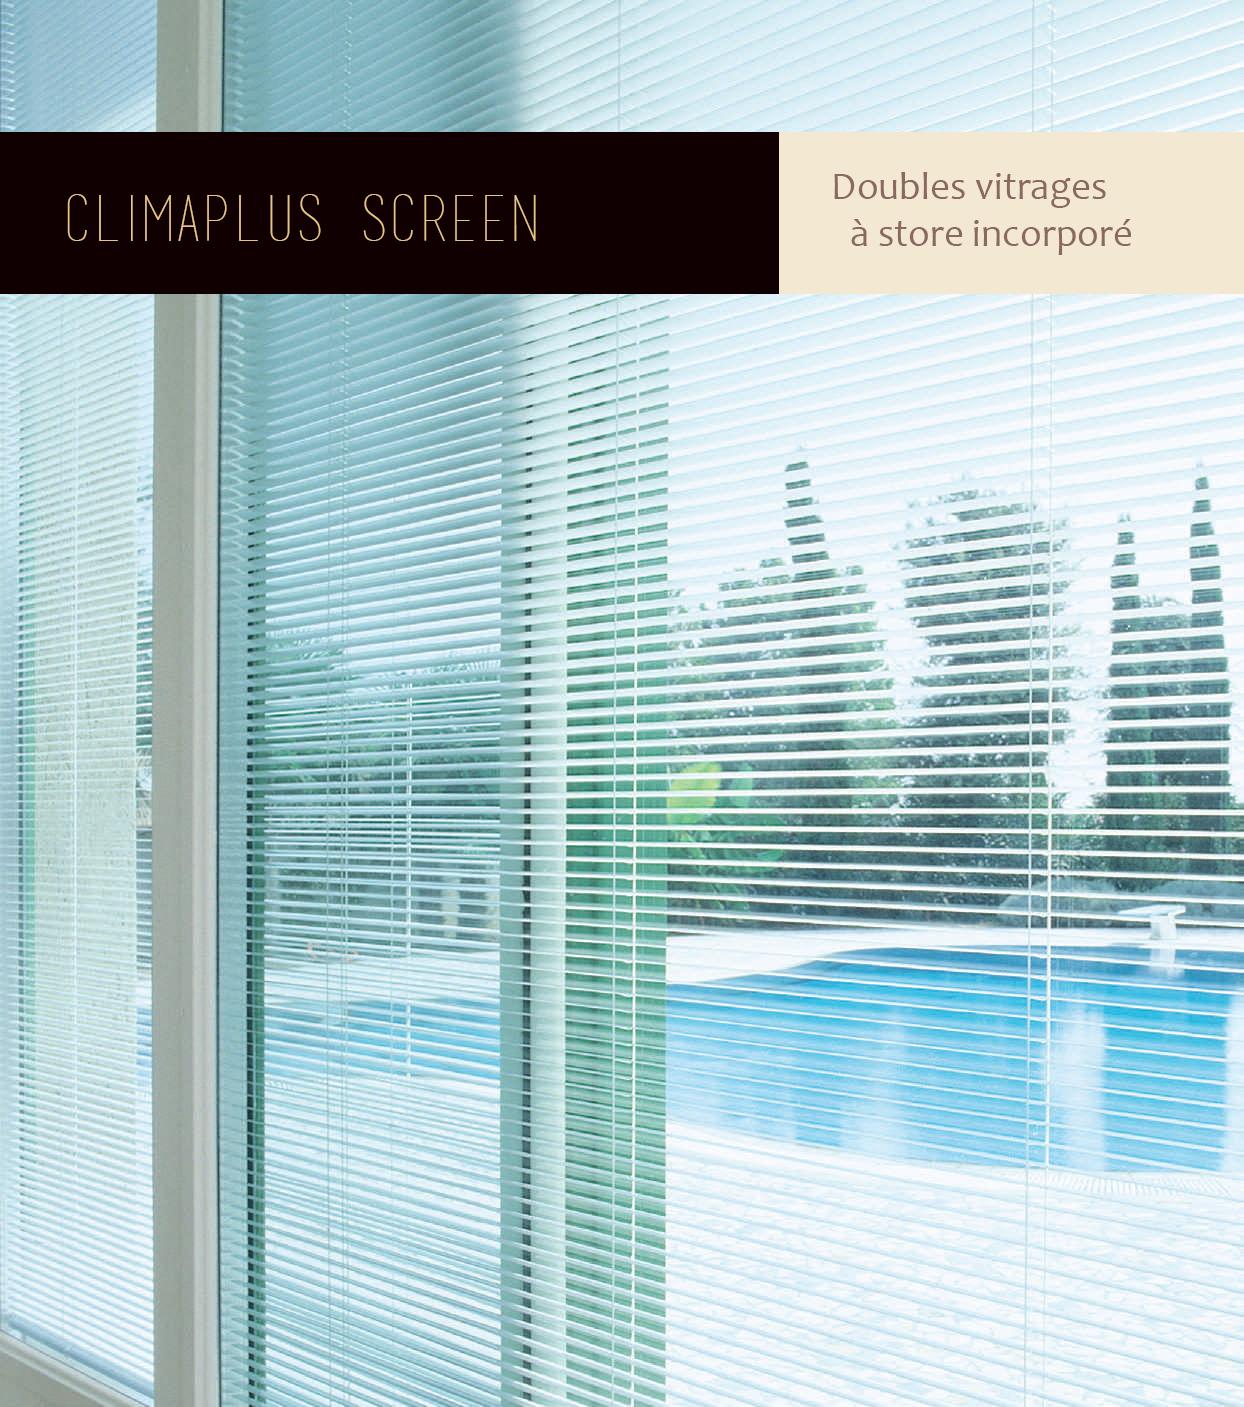 Climaplus Screen